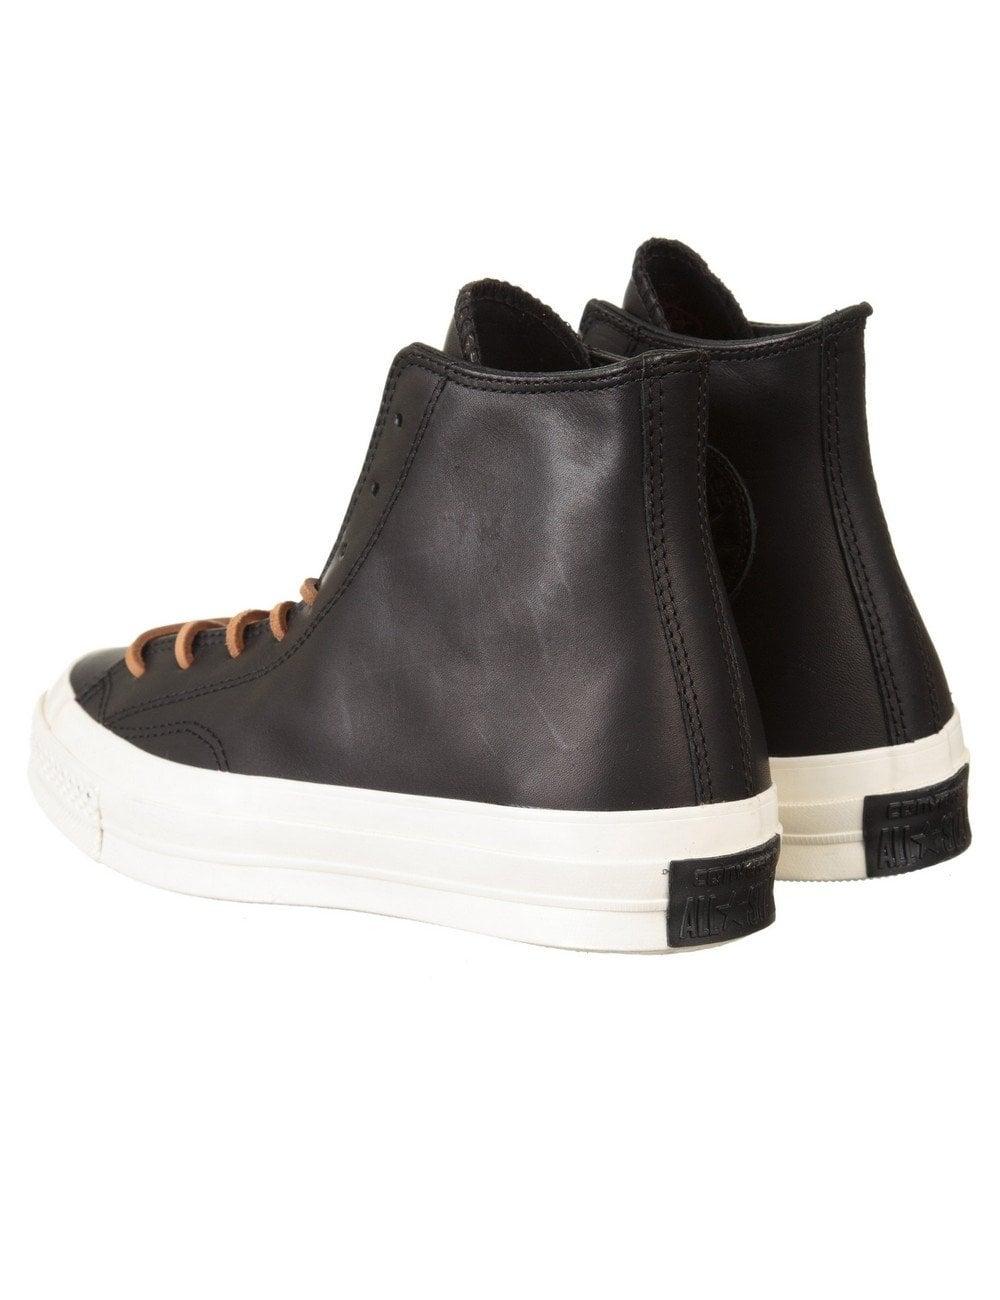 8551255213dc Converse Chuck Taylor 70s Hi Leather Boots - Black Egret - Footwear ...